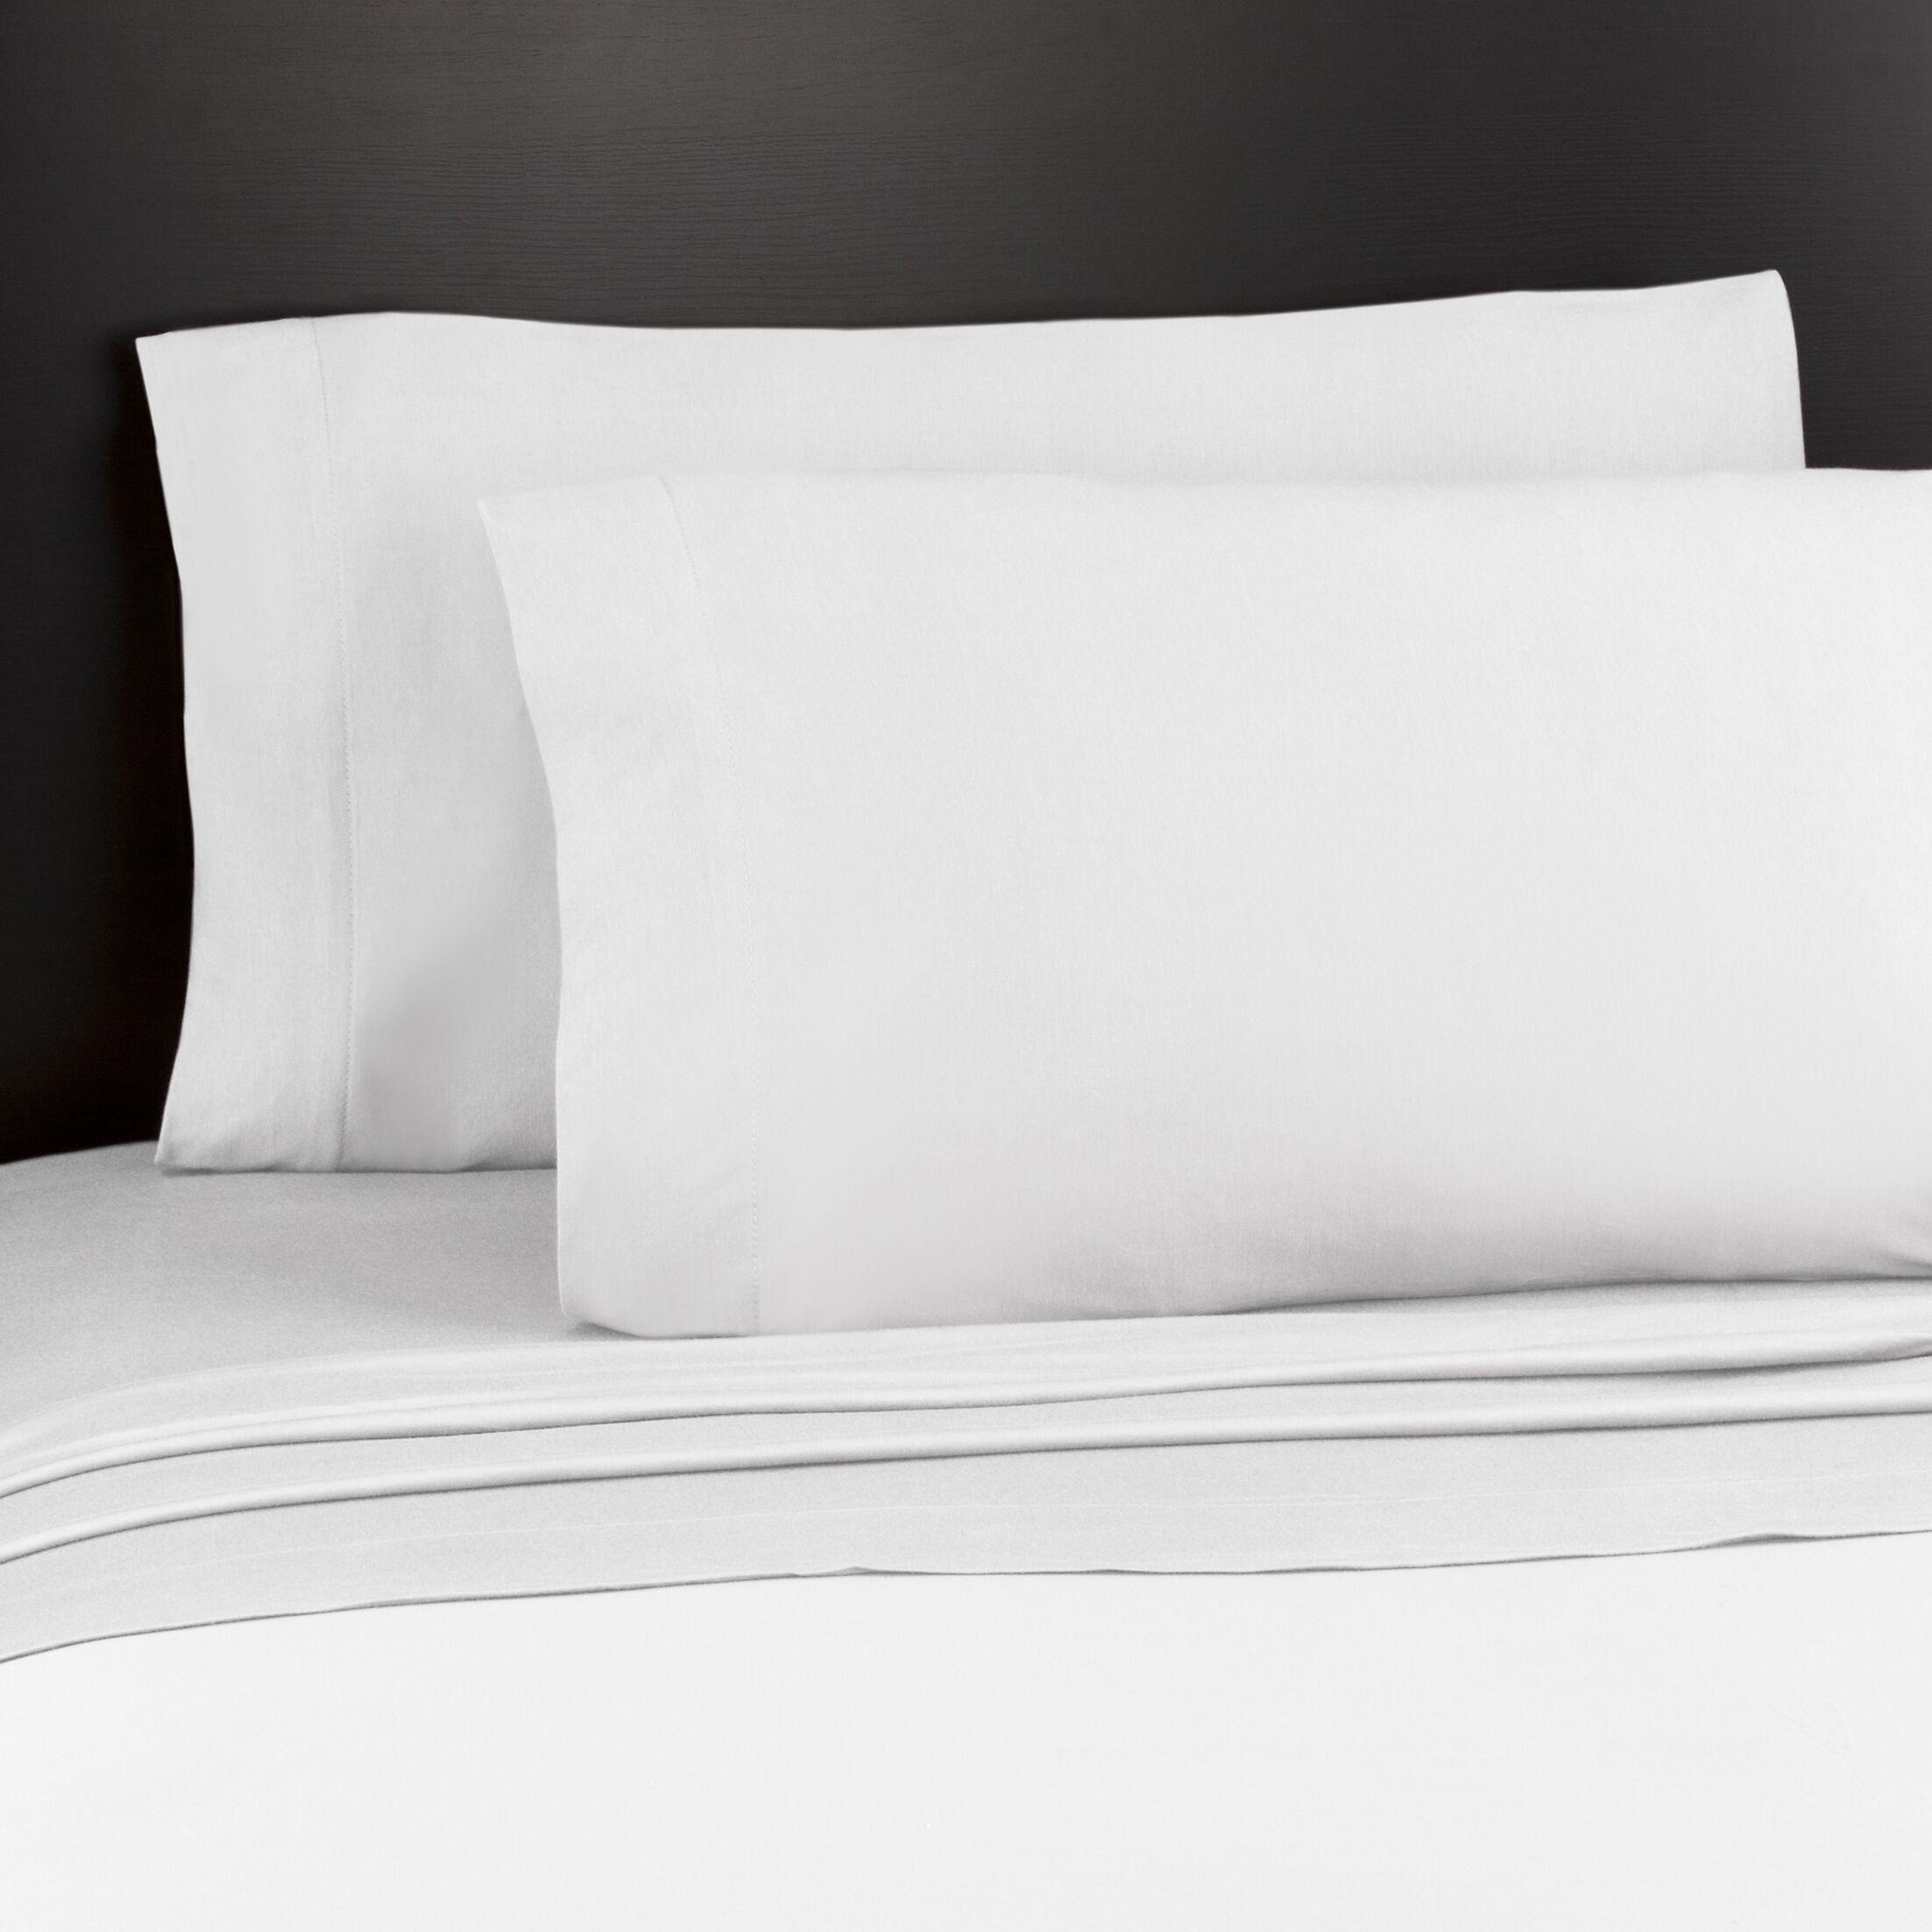 Soft Tees Knit Sheet Set Size: Full, Color: White